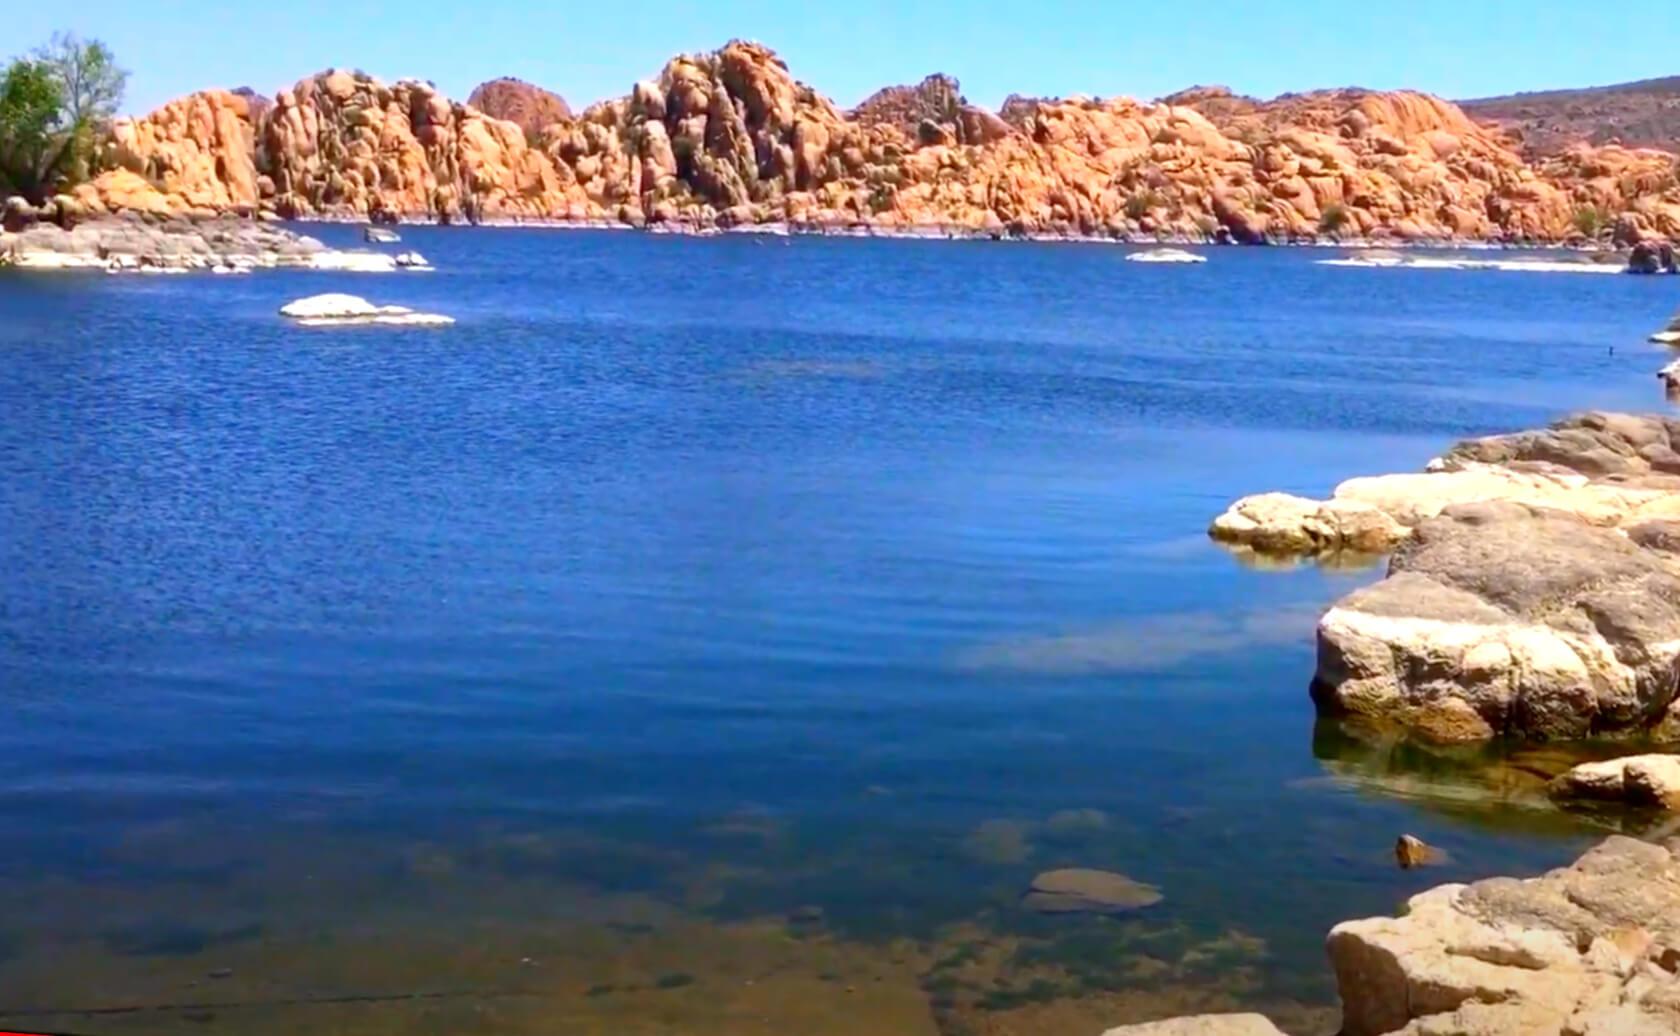 Watson-Lake-Fishing-Guide-Report-Arizona-06